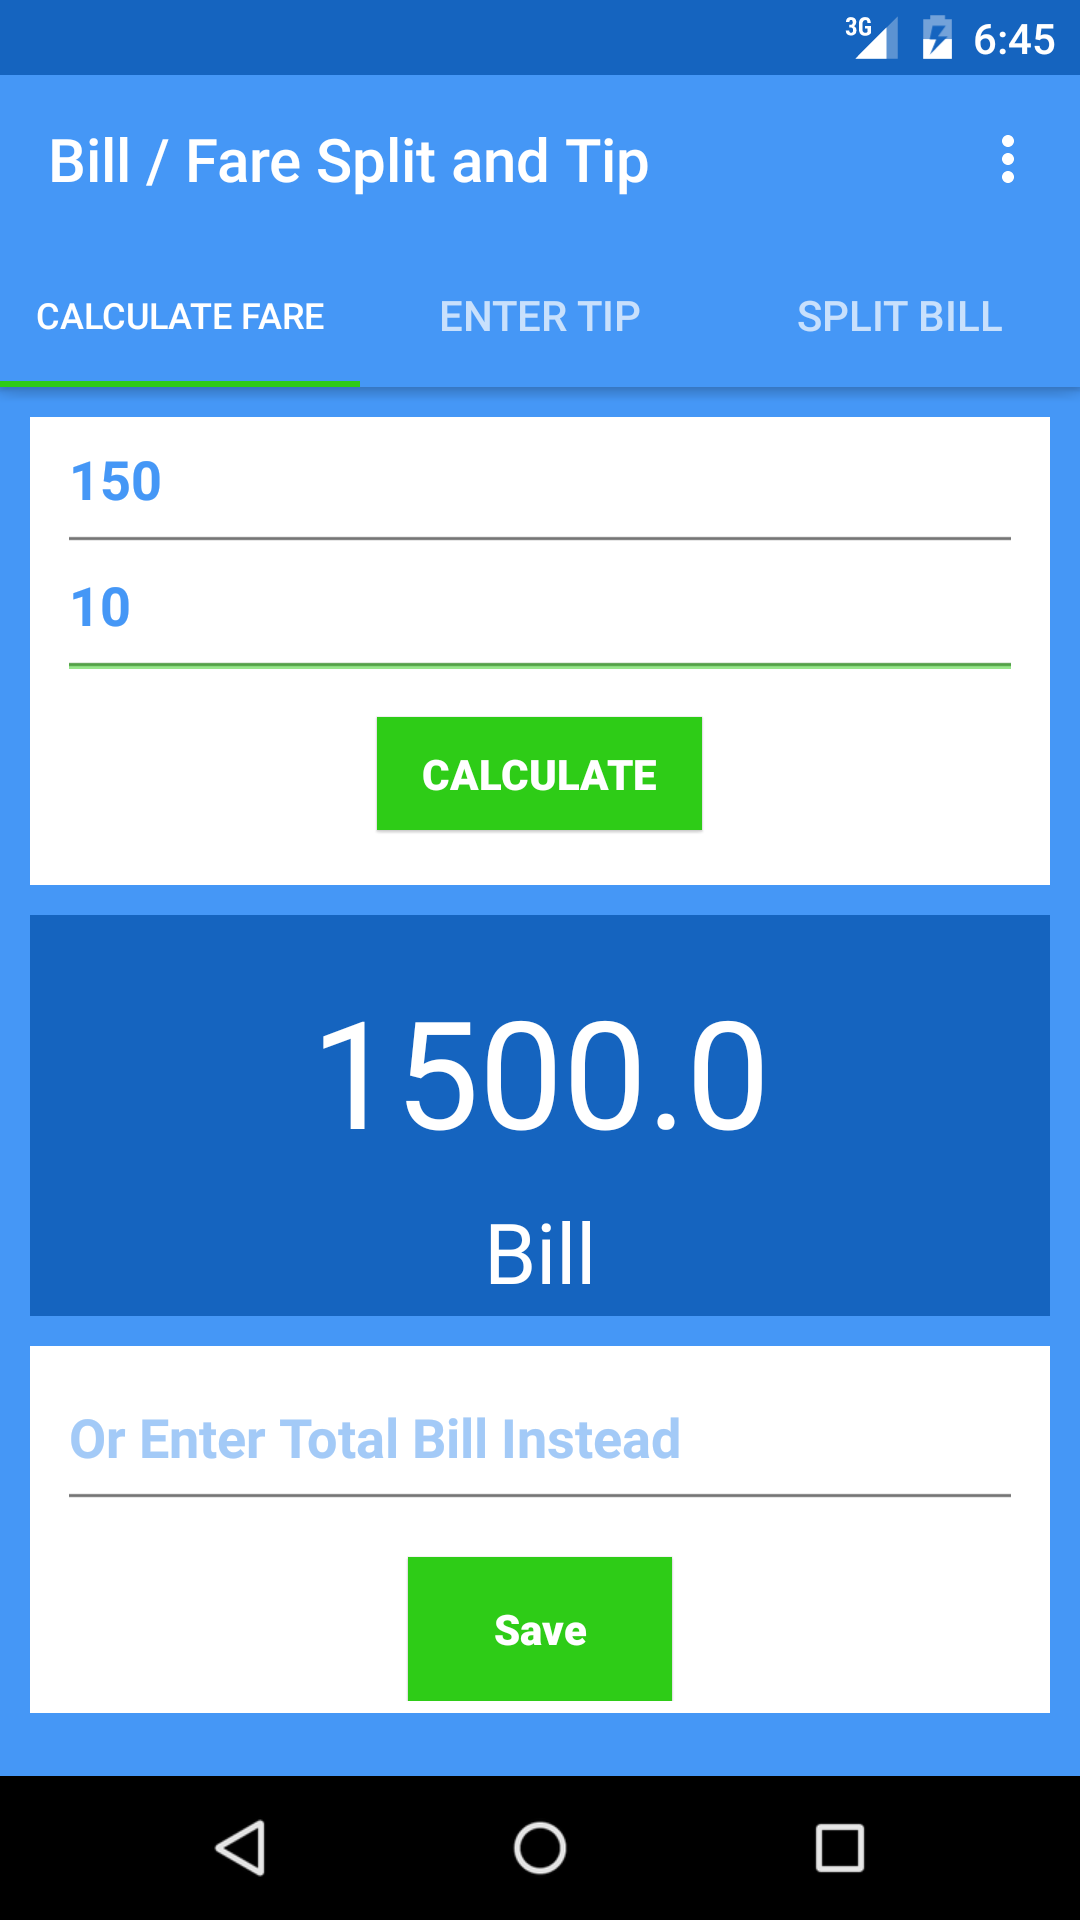 taxi fare calculator tip and split bill. Black Bedroom Furniture Sets. Home Design Ideas